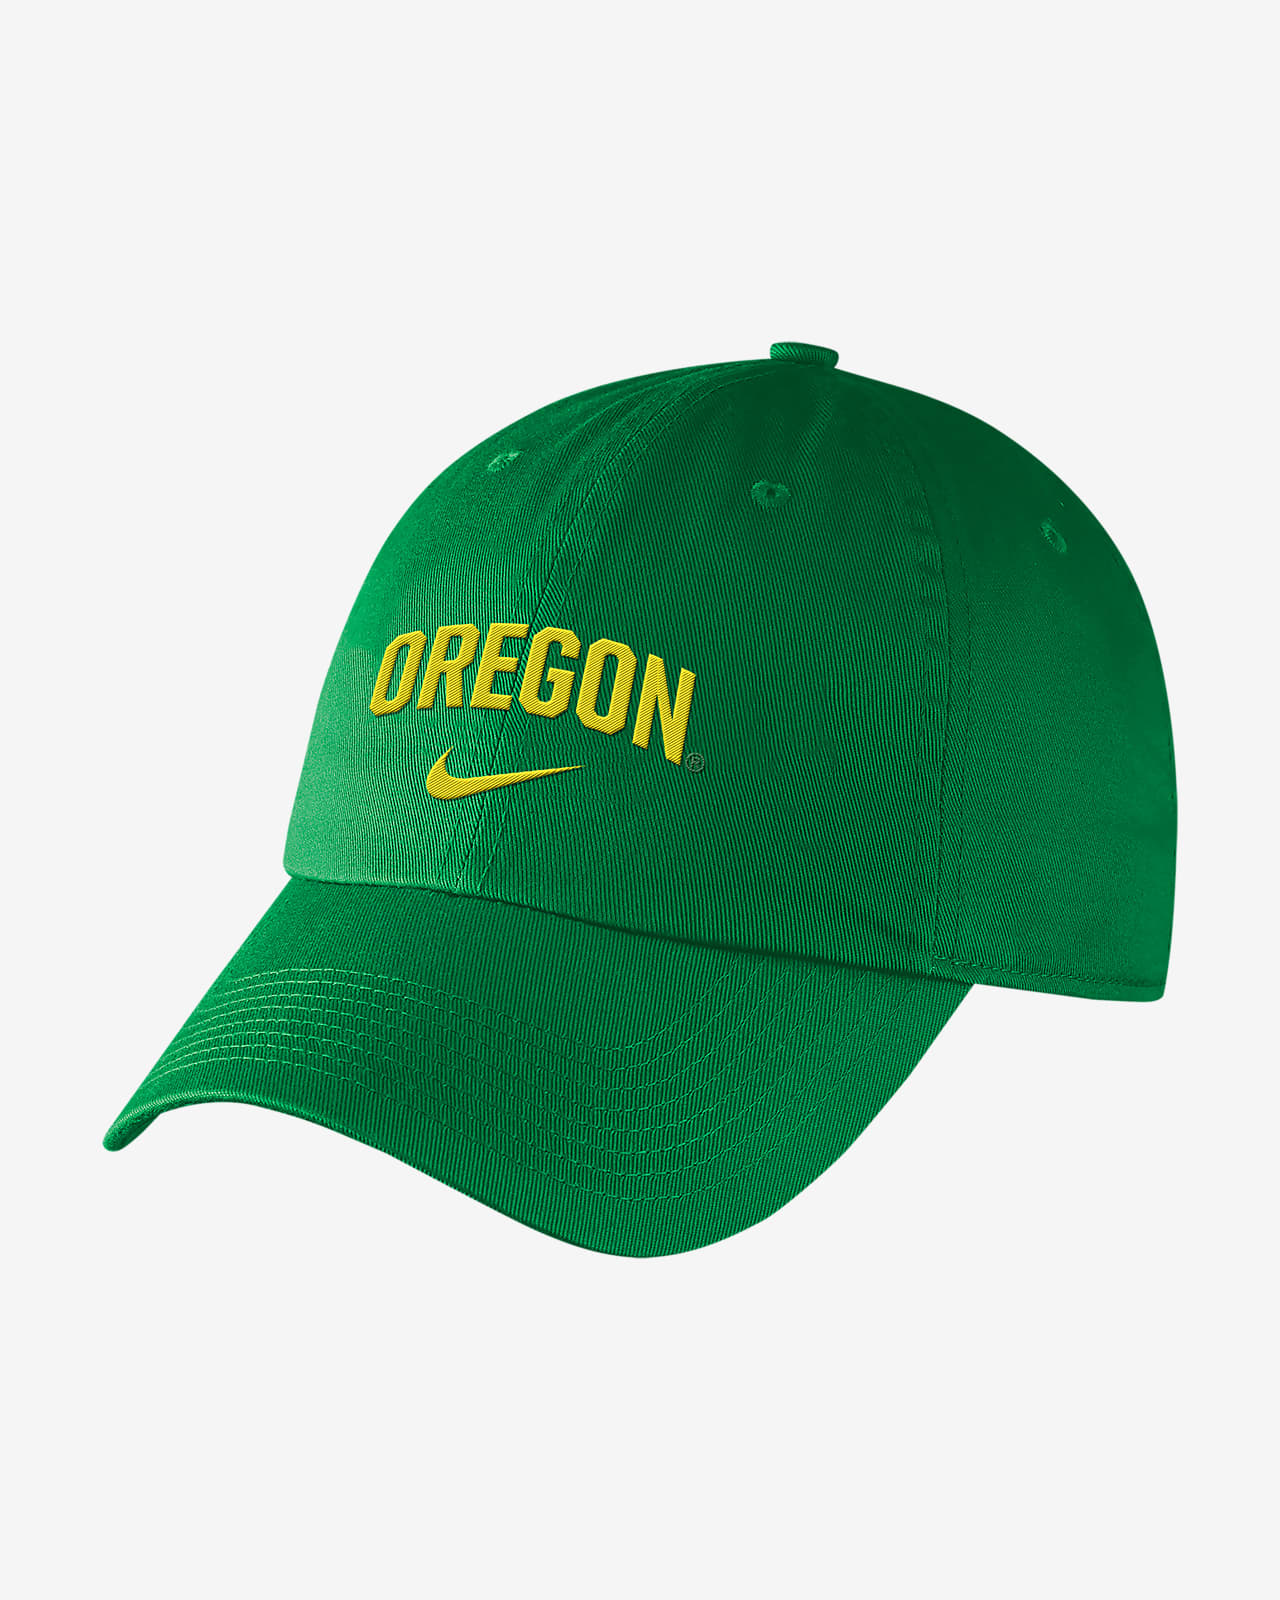 Nike College (Oregon) Hat